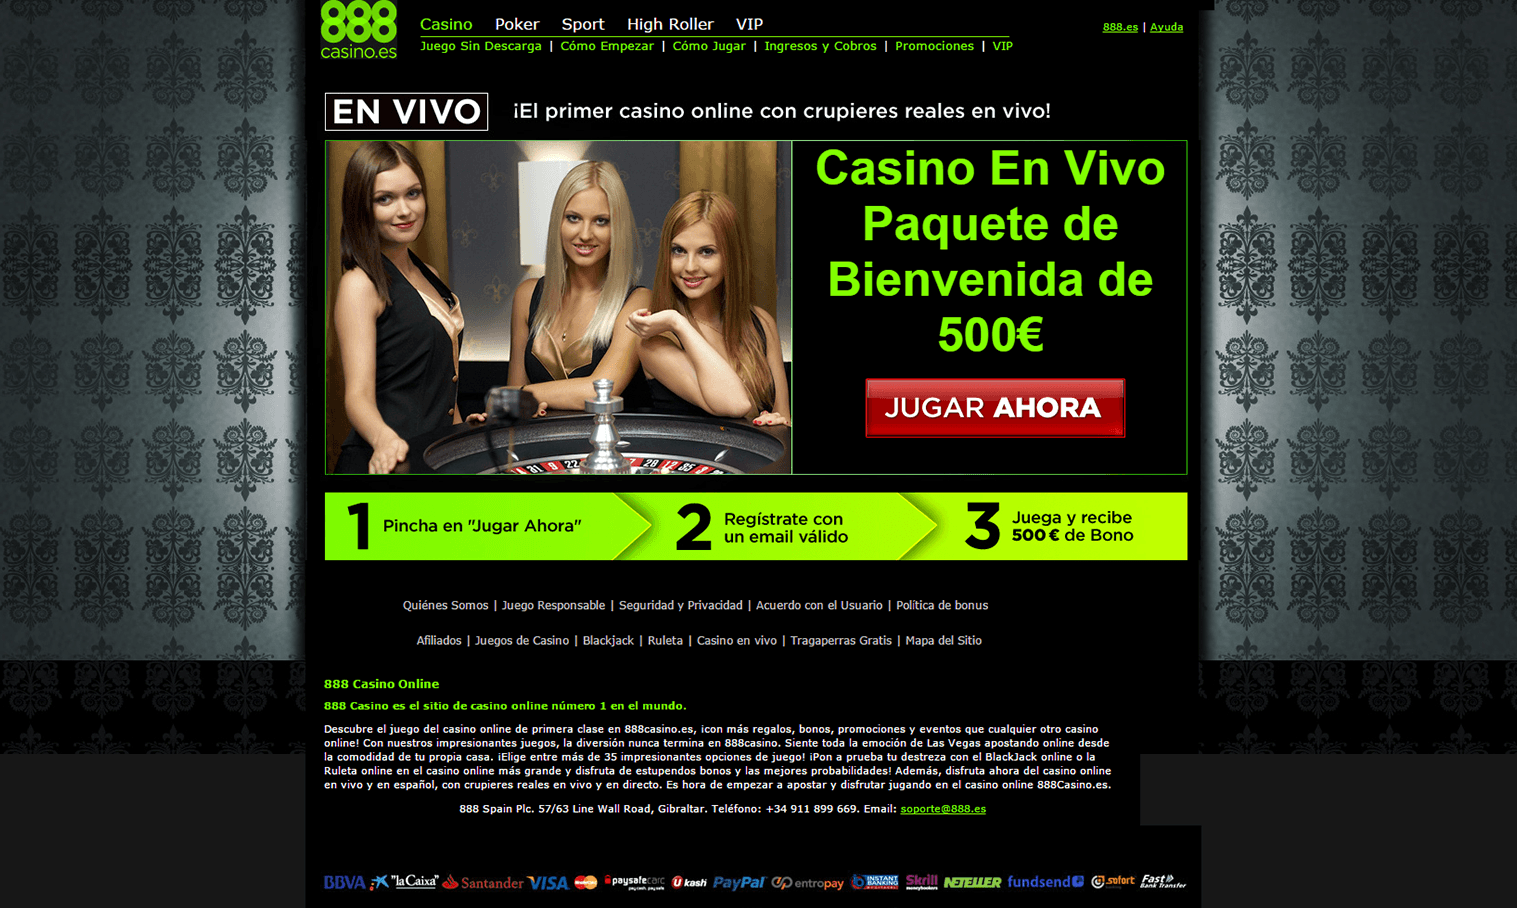 Casino online que pagan casino888 Madrid 827803